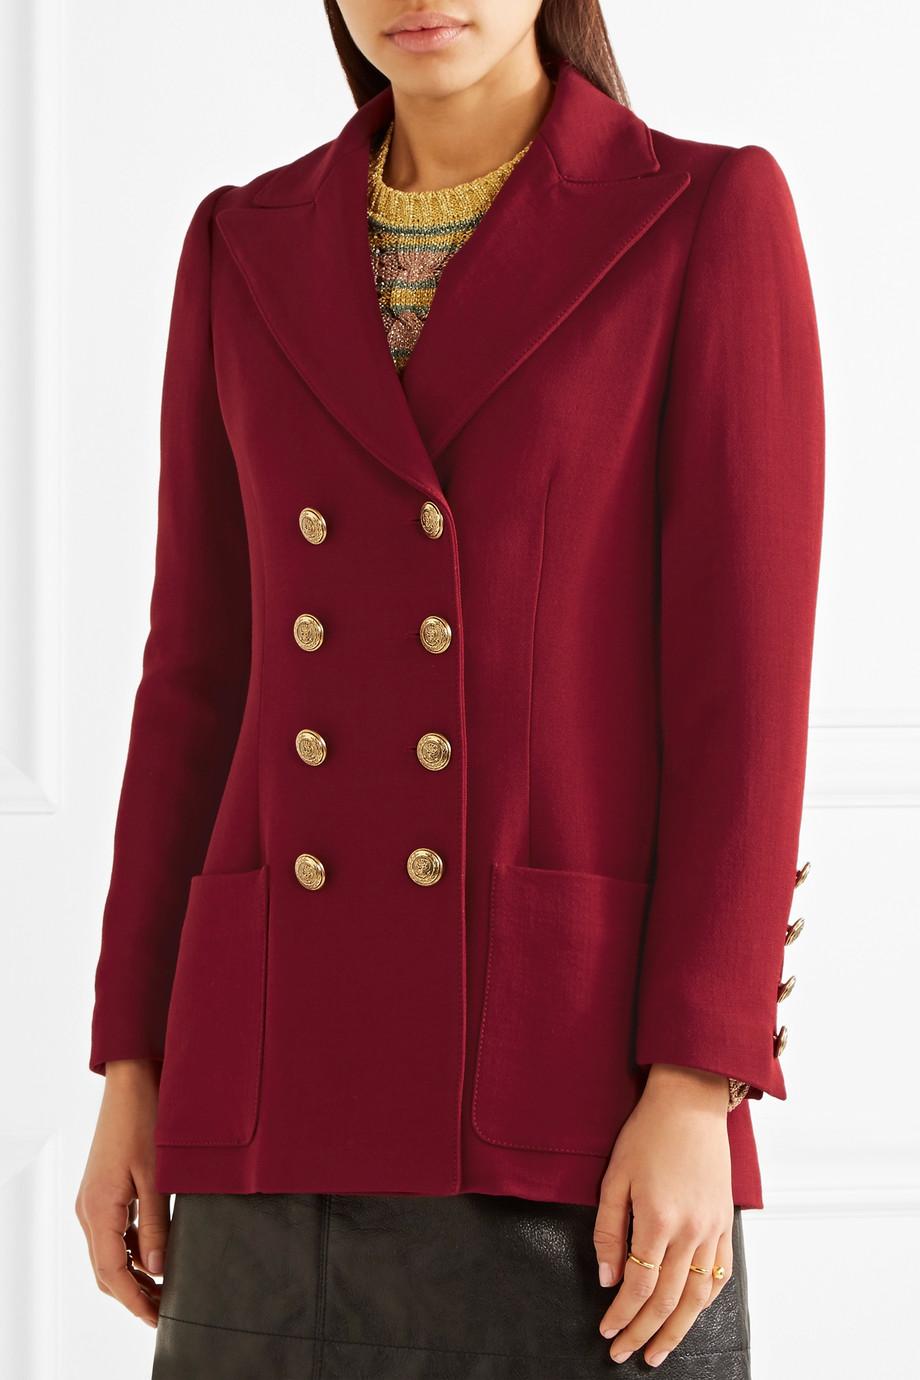 Philosophy di Lorenzo Serafini jacket in burgundy red